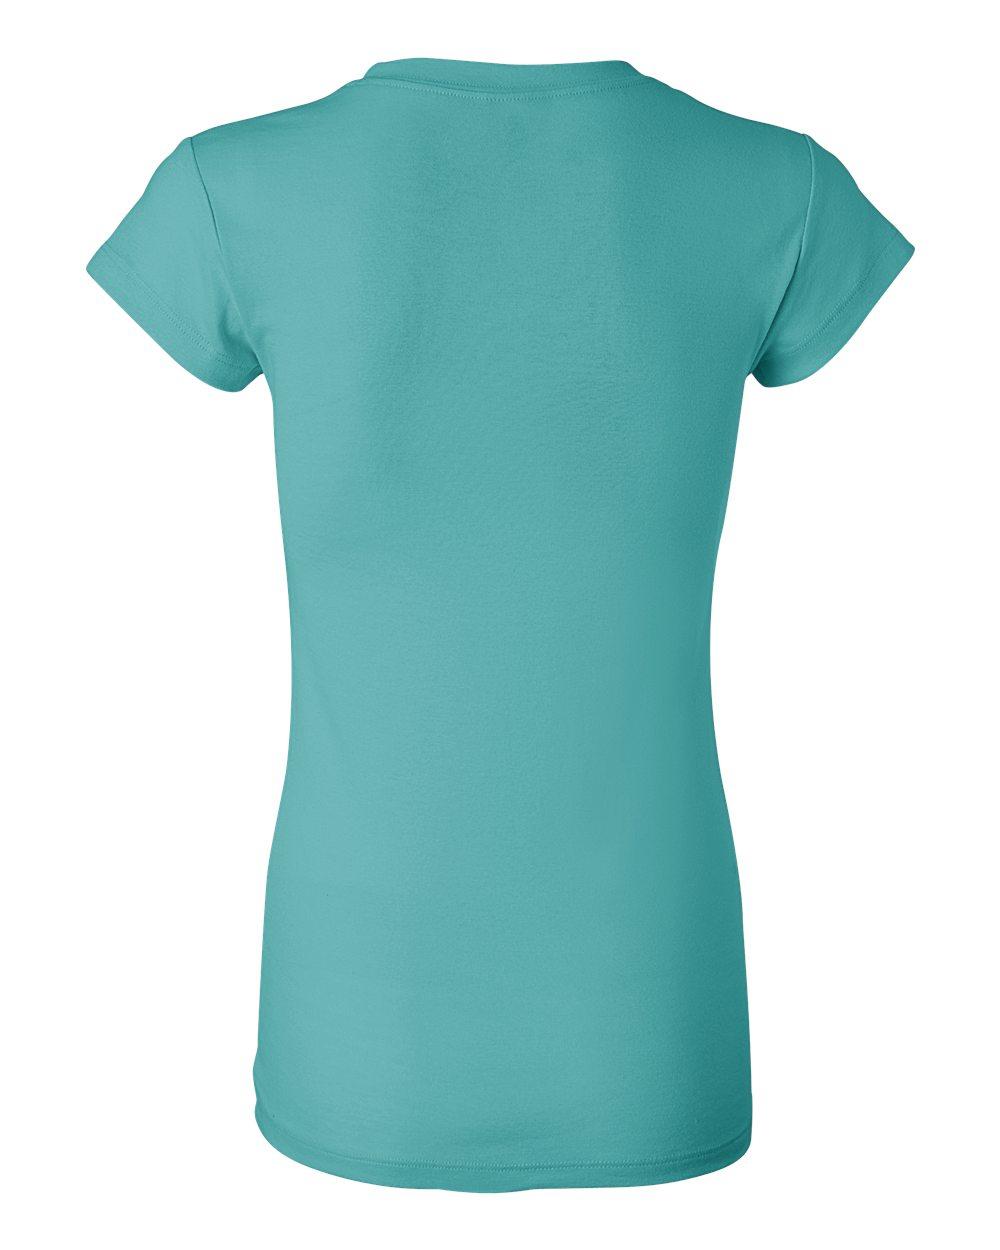 Bella-Canvas-Women-039-s-Sheer-Mini-Rib-Short-Sleeve-T-Shirt-8701-S-2XL thumbnail 25